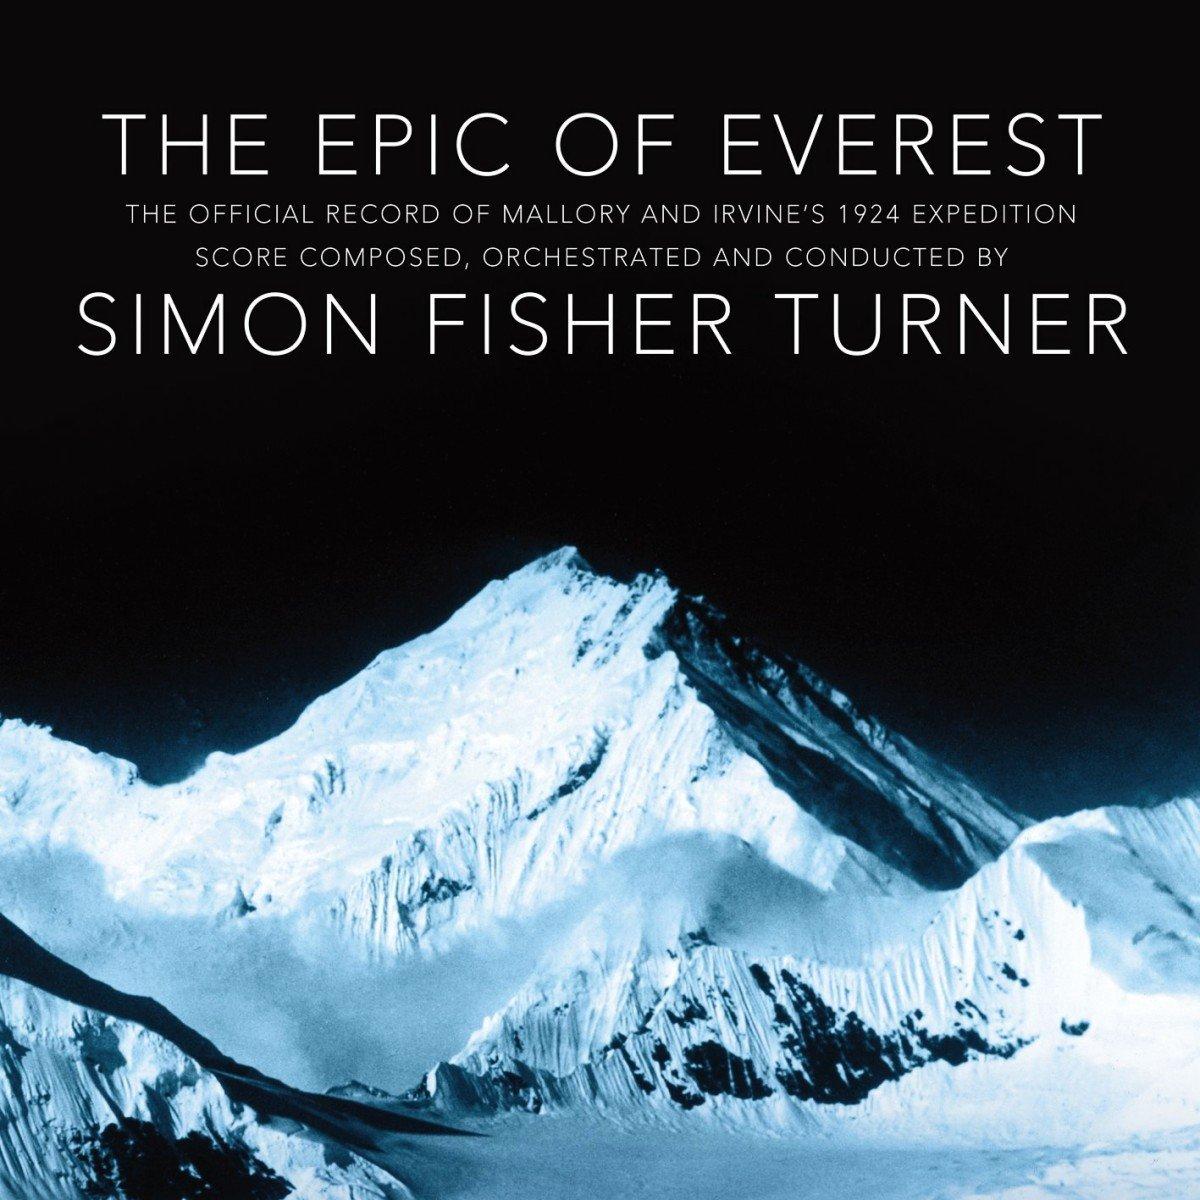 Copertina Disco Vinile 33 giri The Epic of Everest [Soundtrack LP+CD] di Simon Fisher Turner